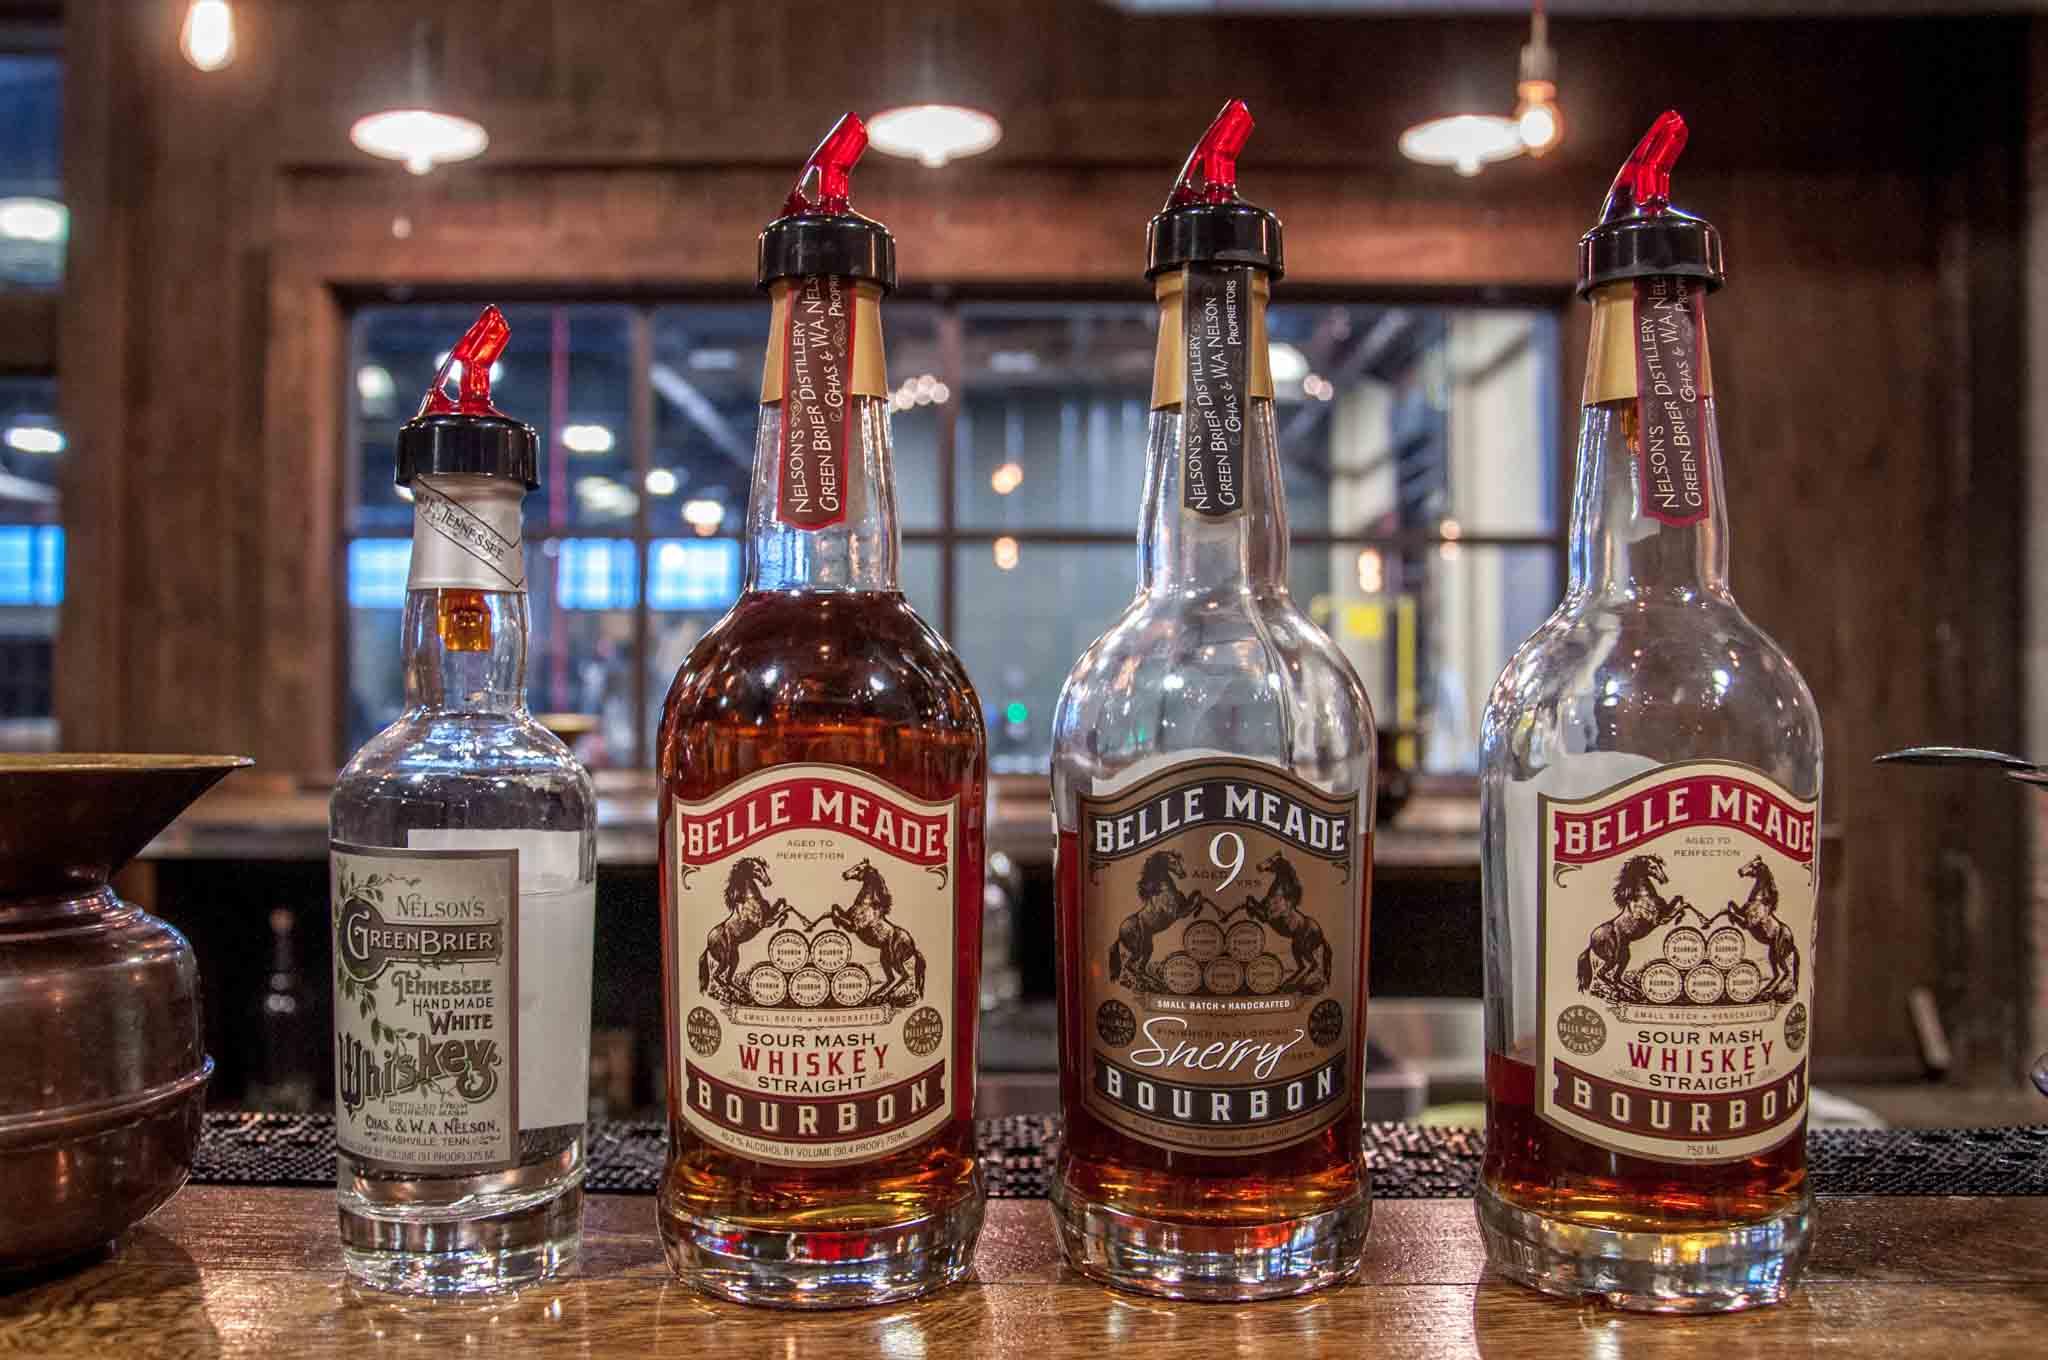 Bottles of spirits on the bar at Nelson's Green Brier Distillery